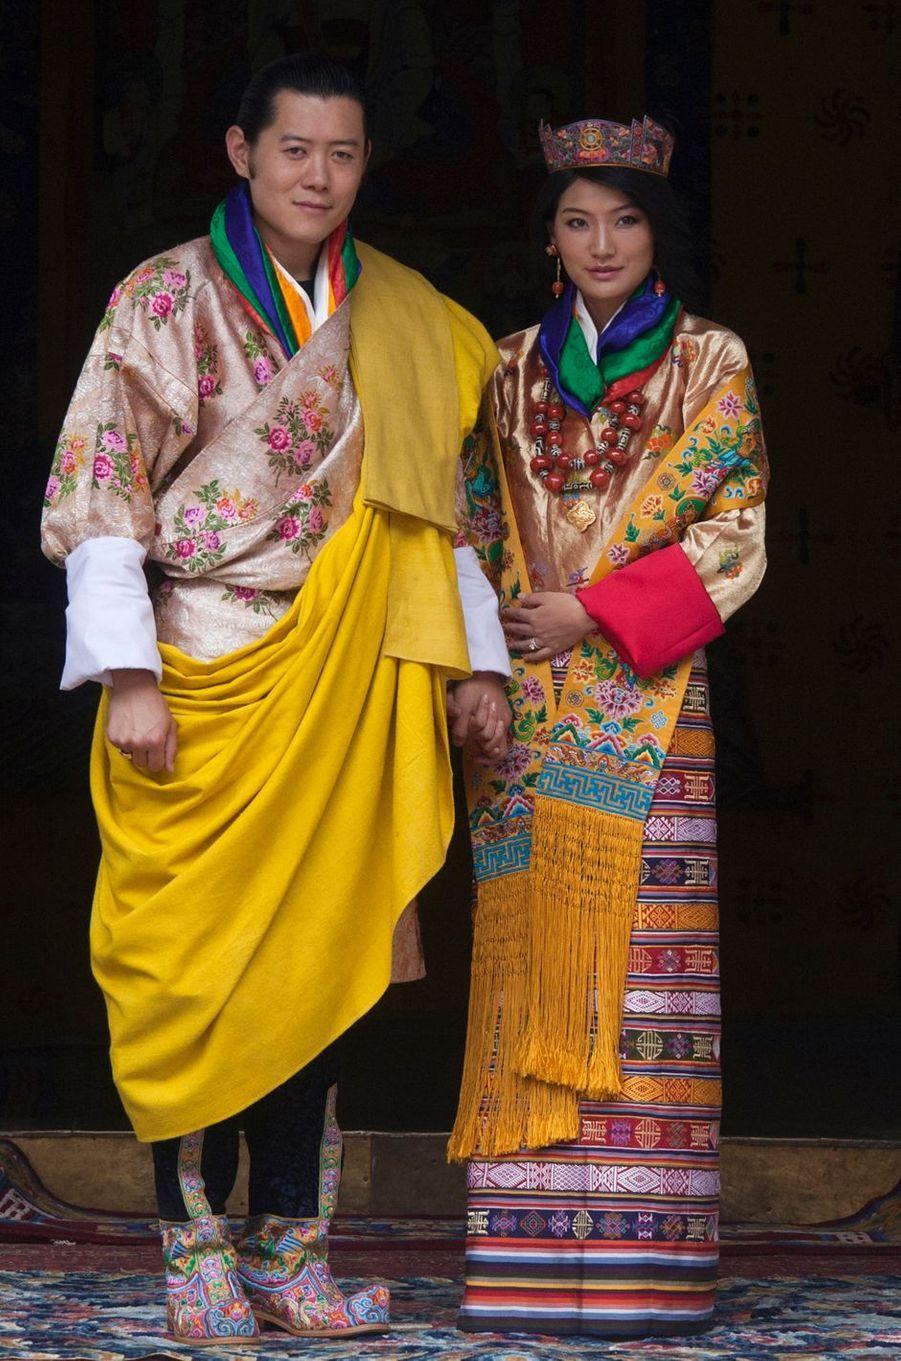 Le roi du Bhoutan Jigme Khesar Namgyel Wangchuck épouse Jetsun Pema le 13 octobre 2011